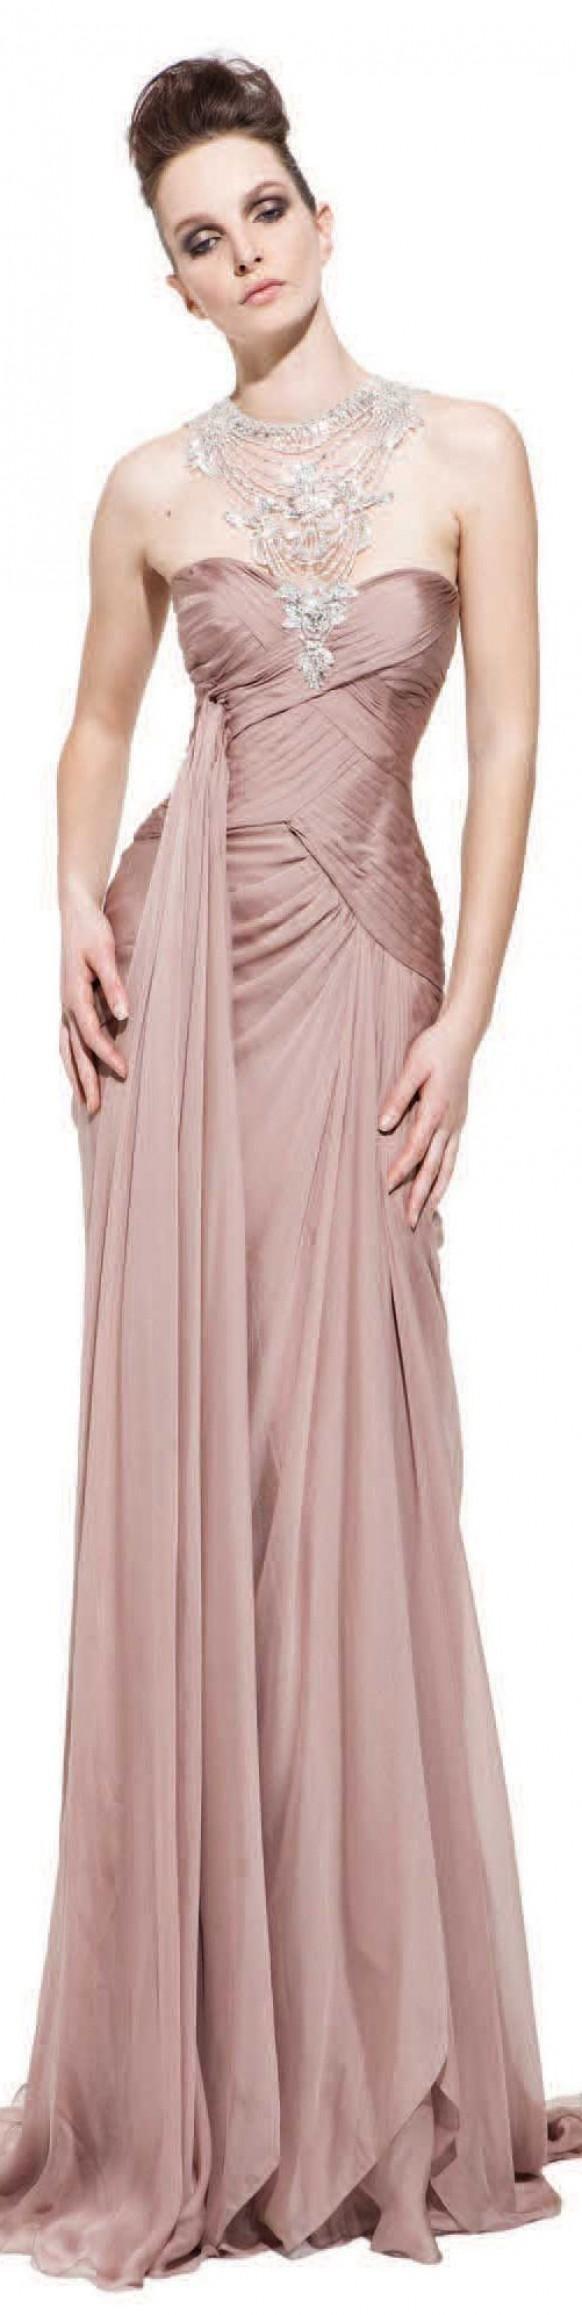 10 best Wedding dresses images on Pinterest   Bridal gowns ...